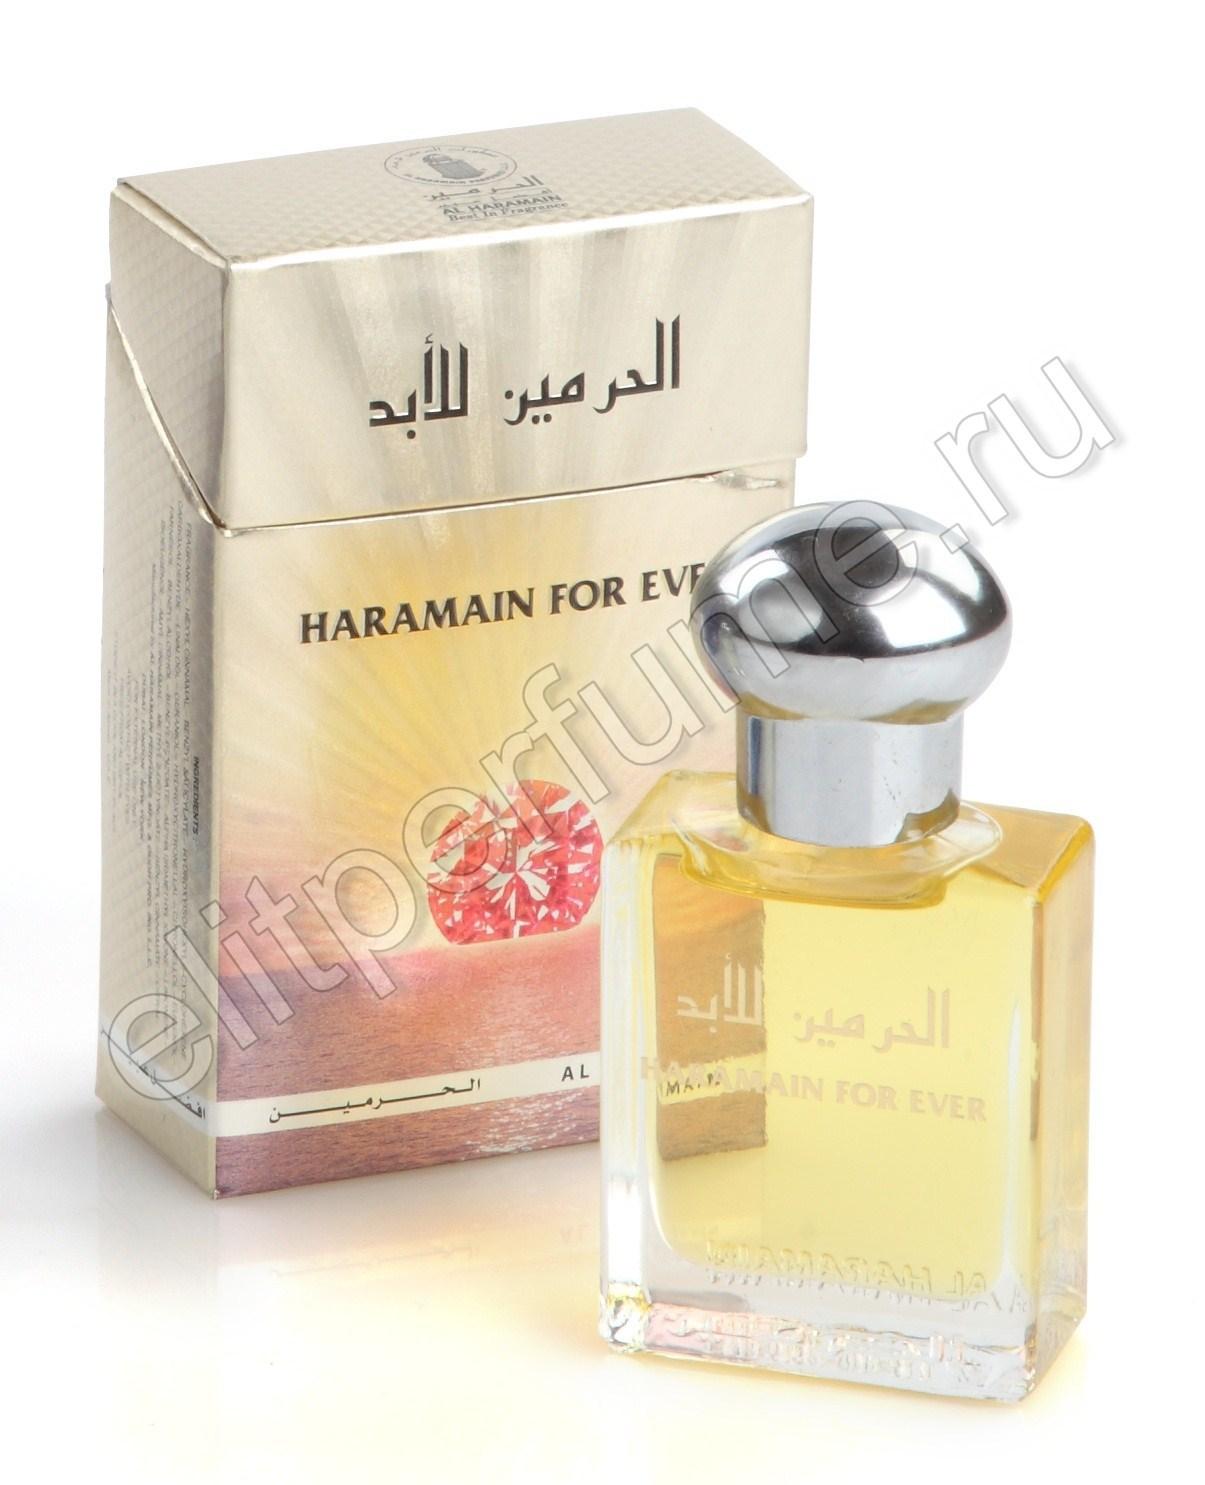 Харамайн Навсегда Haramain Forever 15 мл арабские масляные духи от Аль Харамайн Al Haramain Perfumes